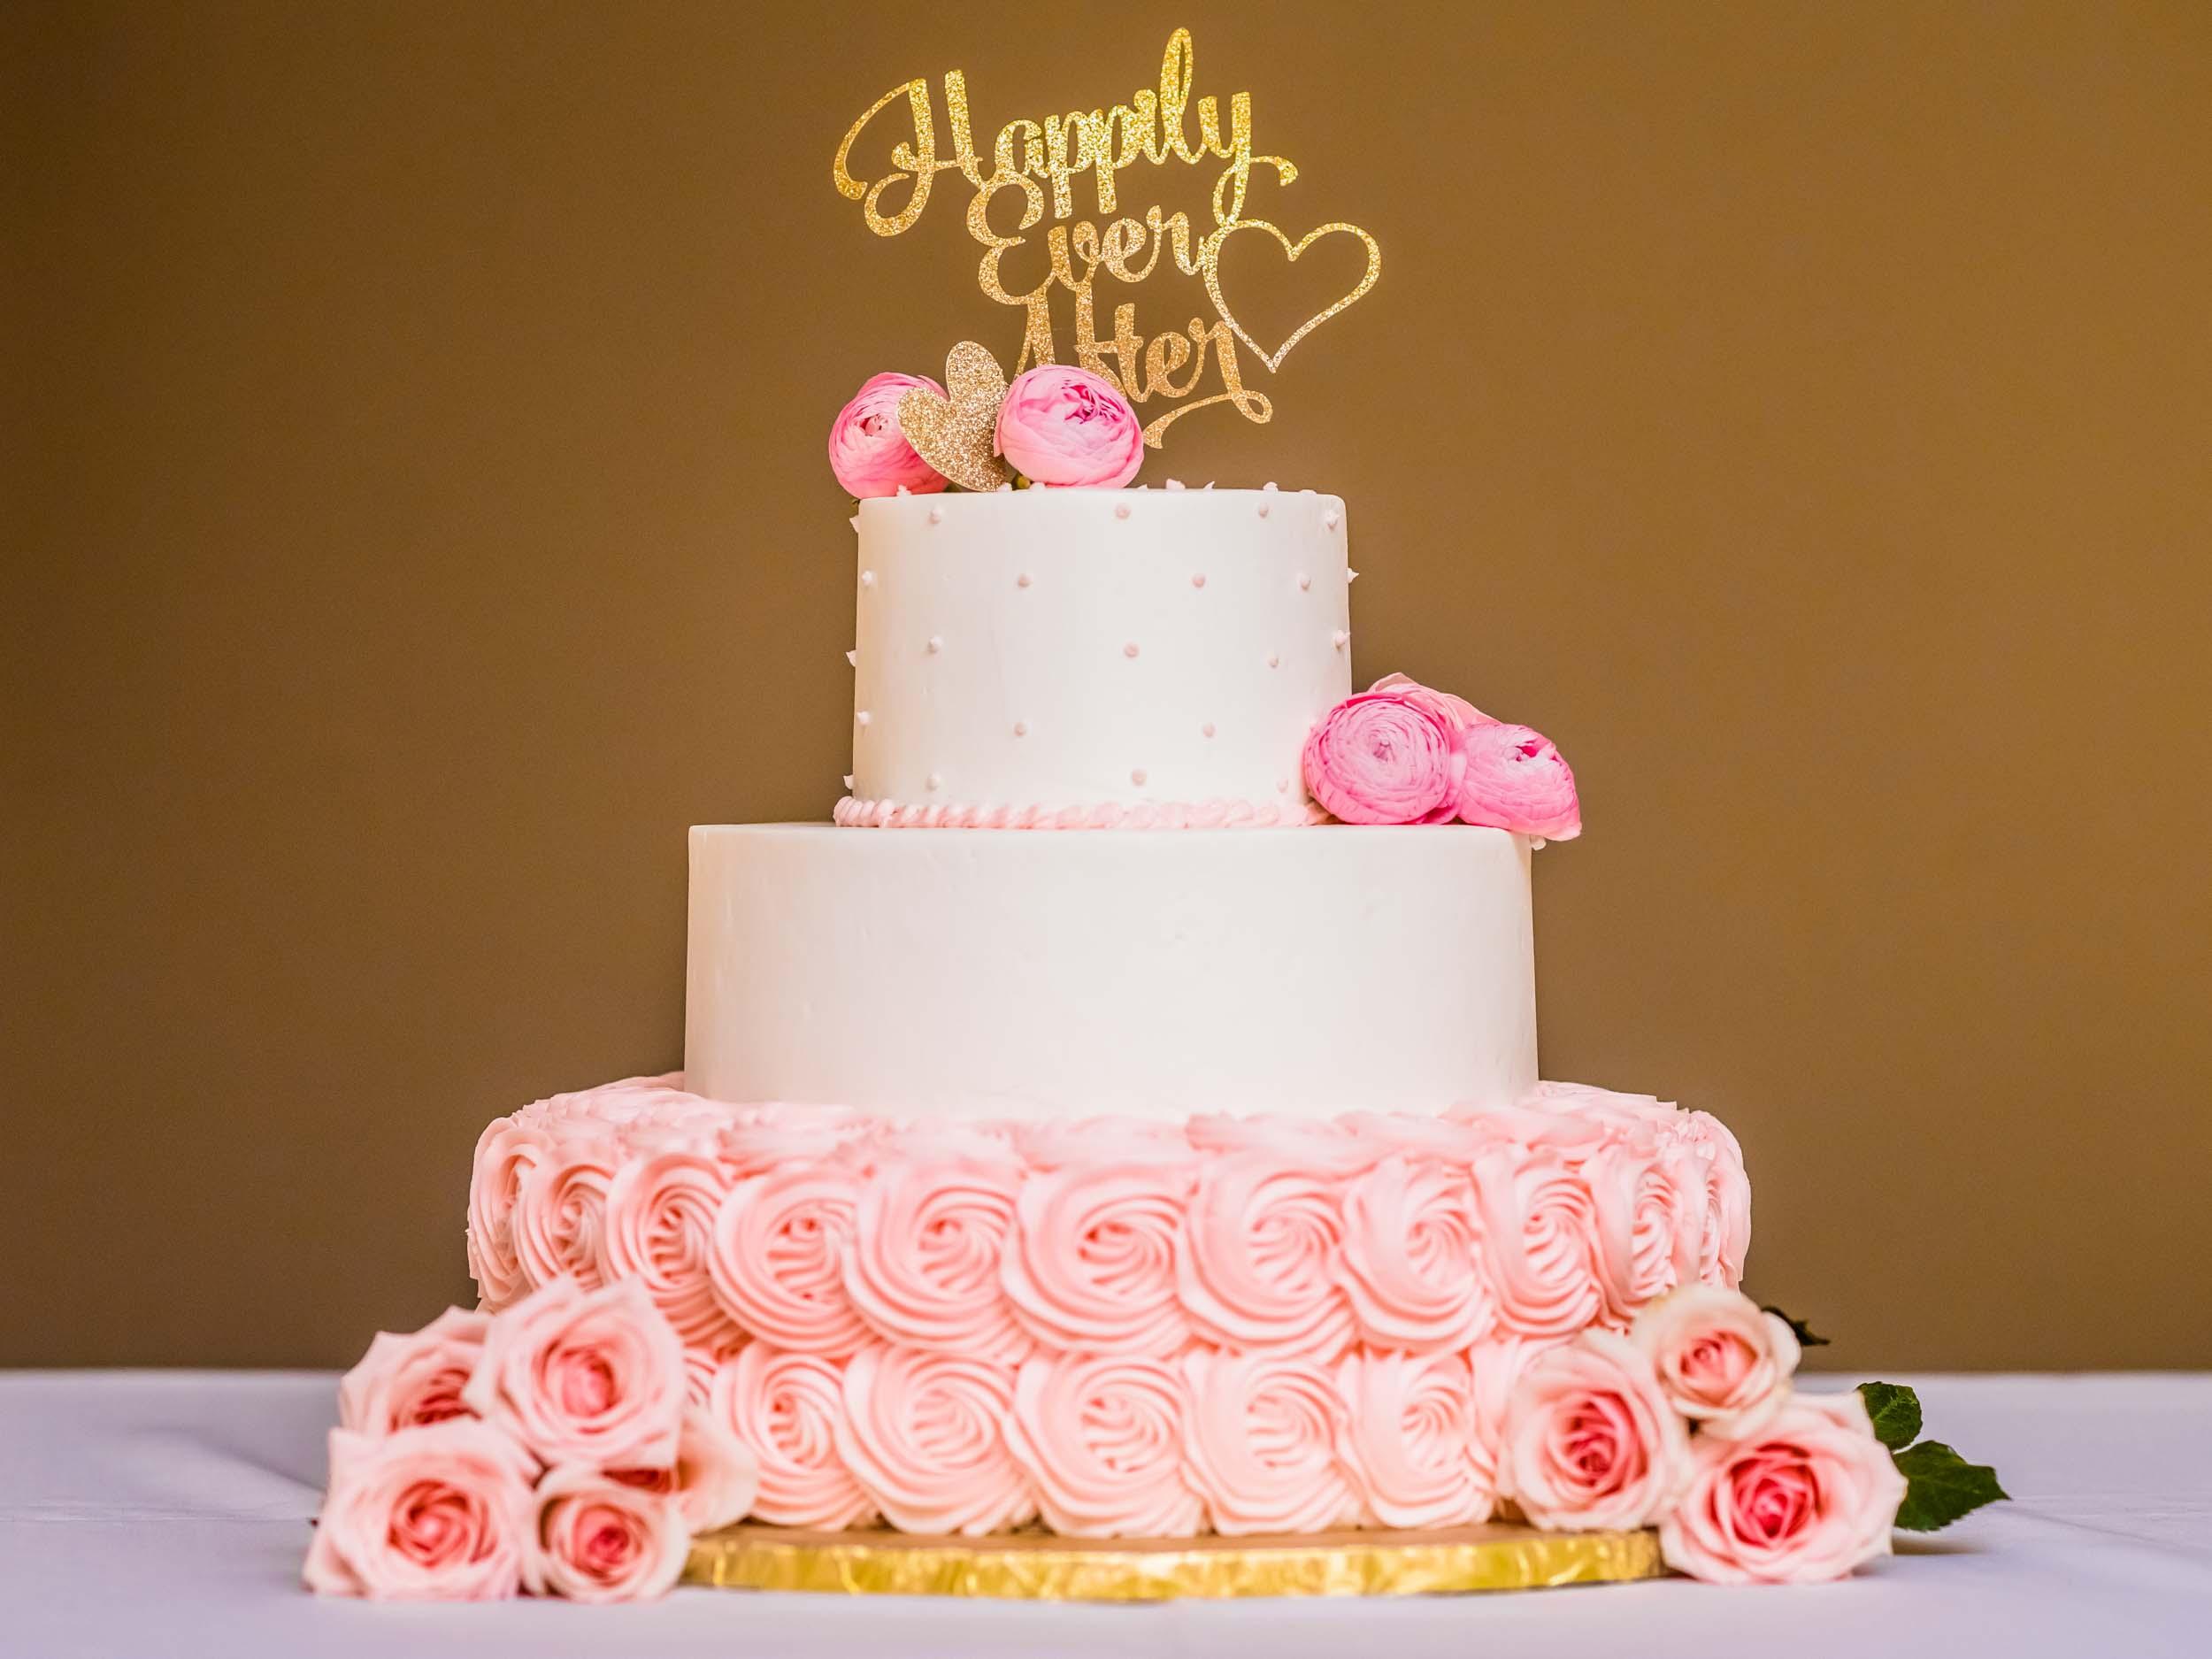 dc+metro+wedding+photographer+vadym+guliuk+photography+wedding+cake-2026.jpg